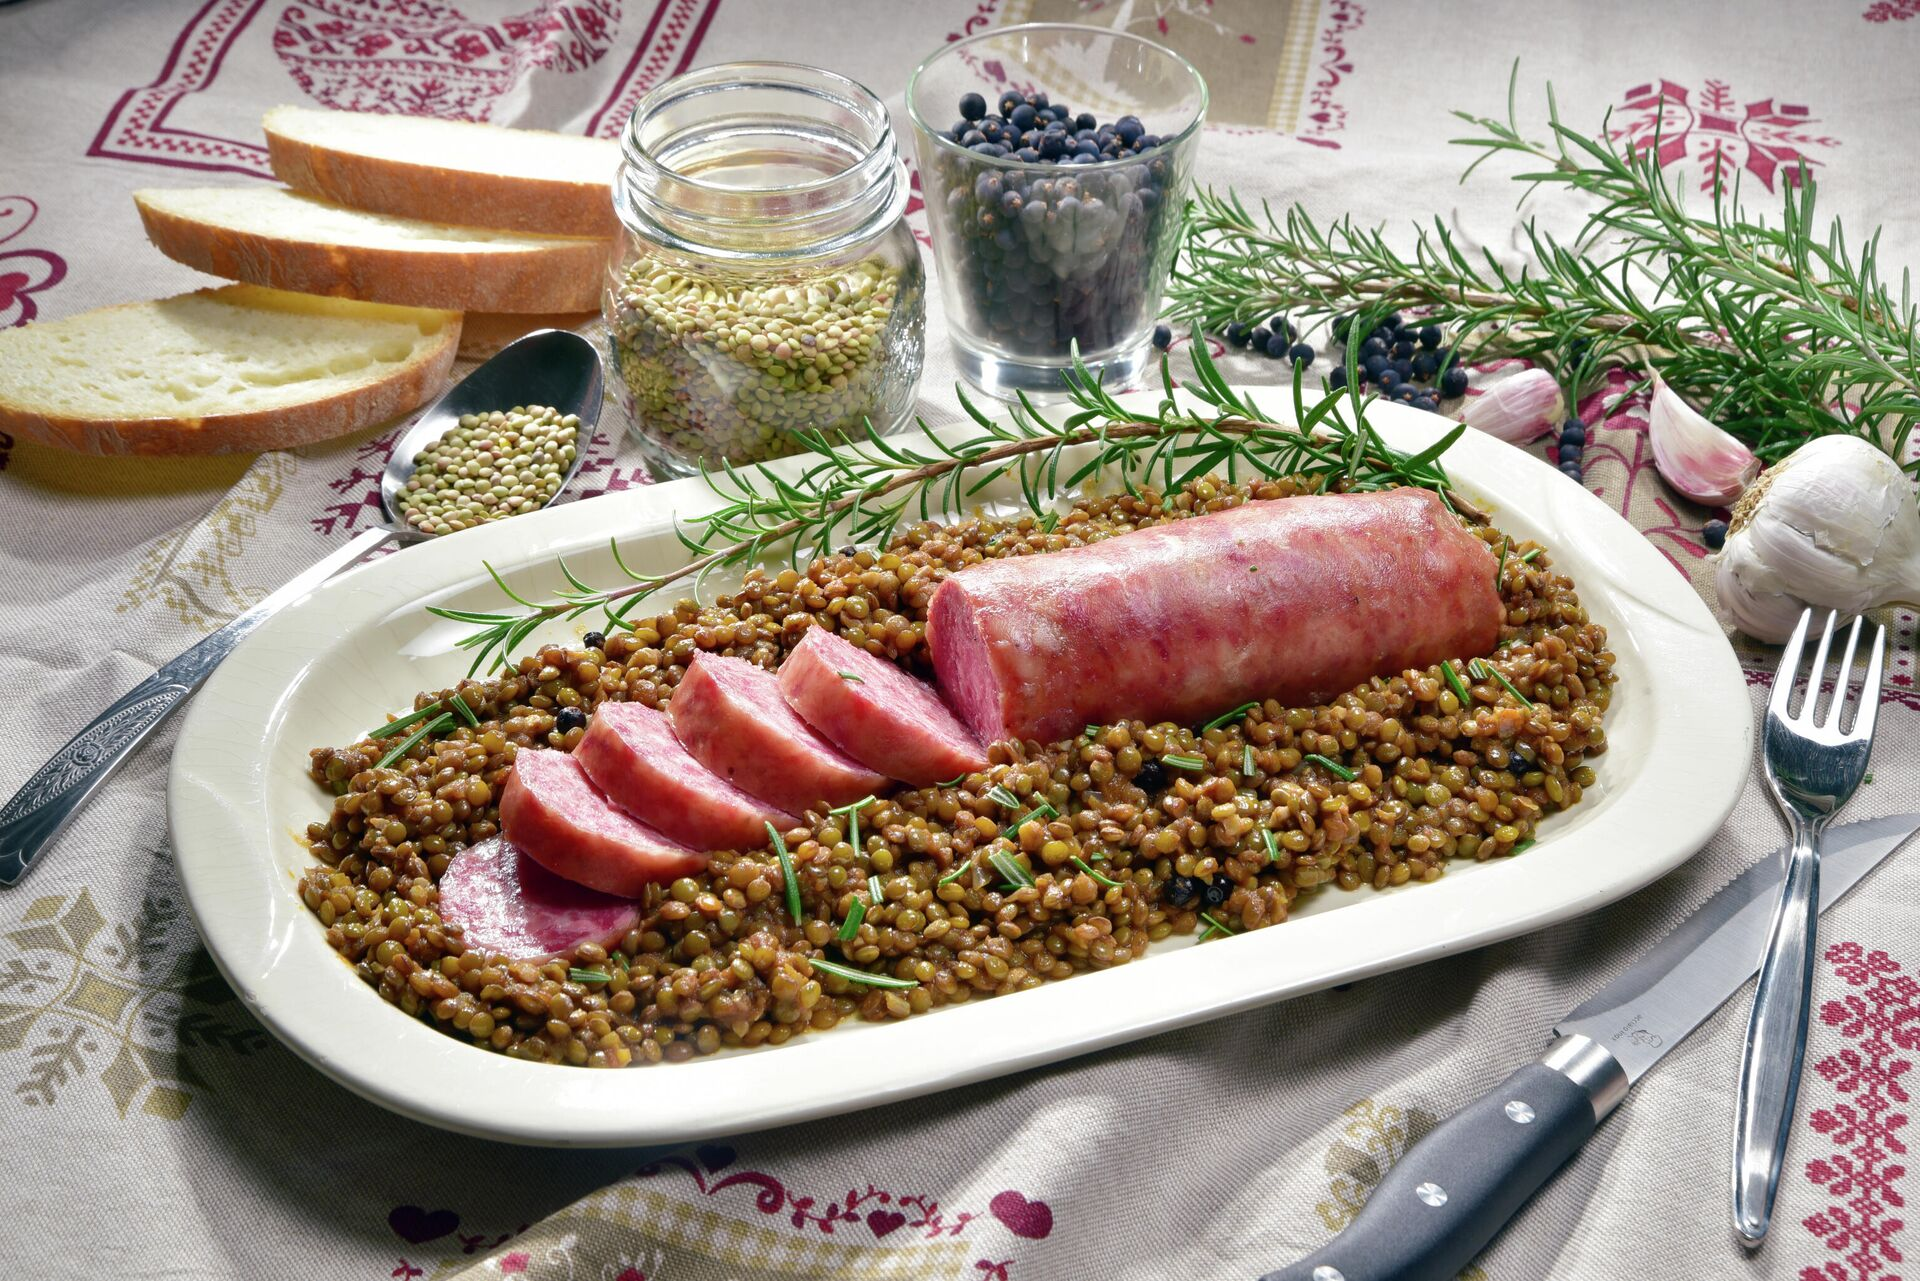 Итальянское блюдо Cotechino con le lenticchie - РИА Новости, 1920, 24.12.2020